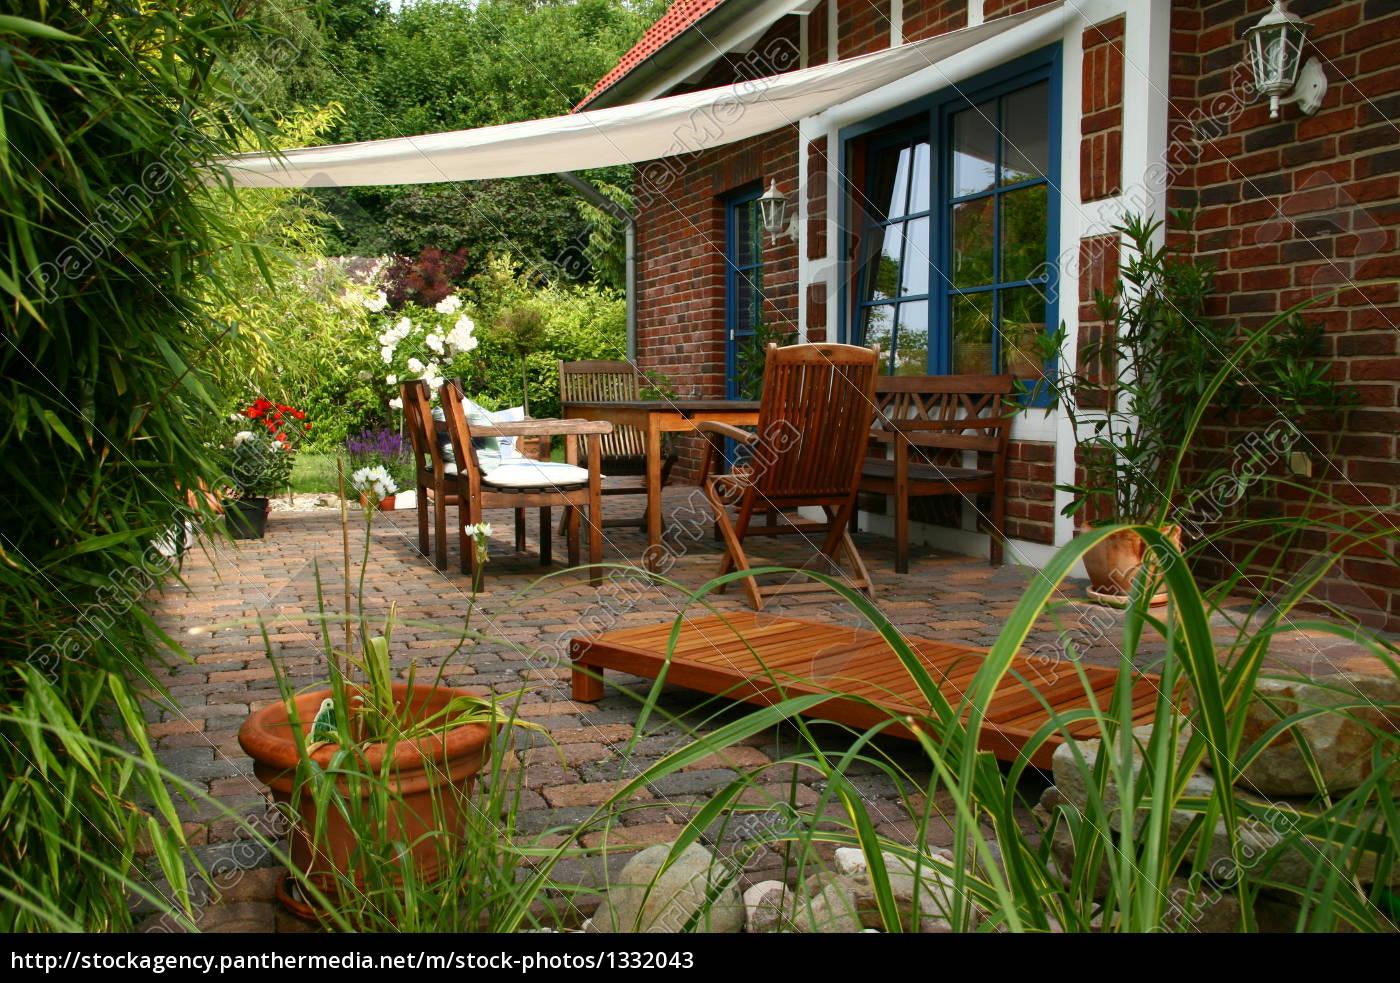 terrace - 1332043